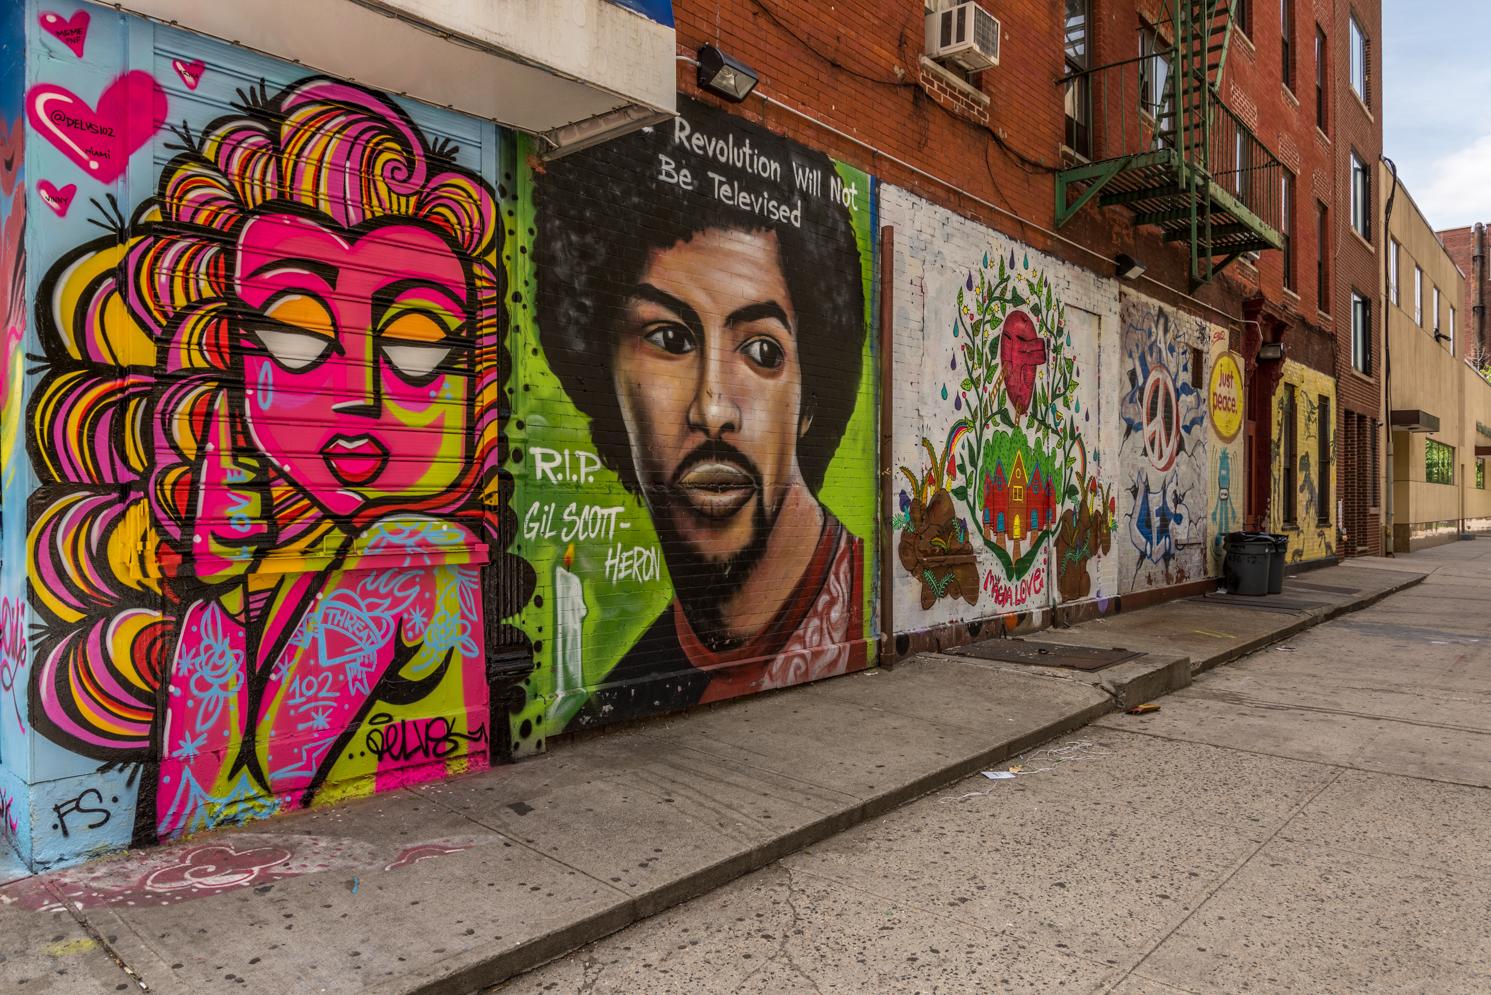 ROCK MAMA NYC LIFESTYLE BLOG - East Village Part 1